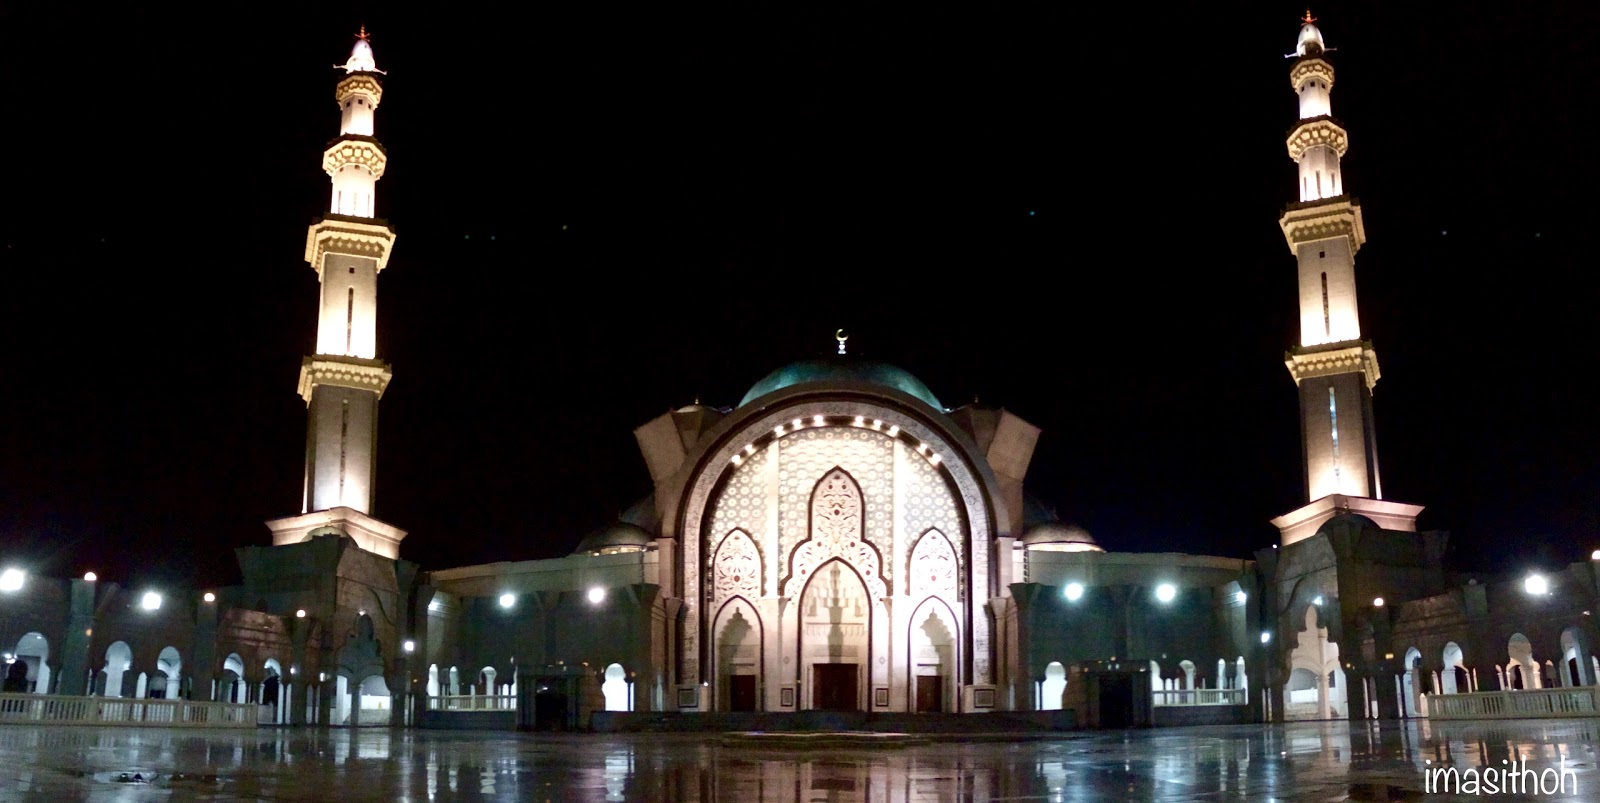 Masjid Wilayah Persektuan Kuala Lumpur Malaysia